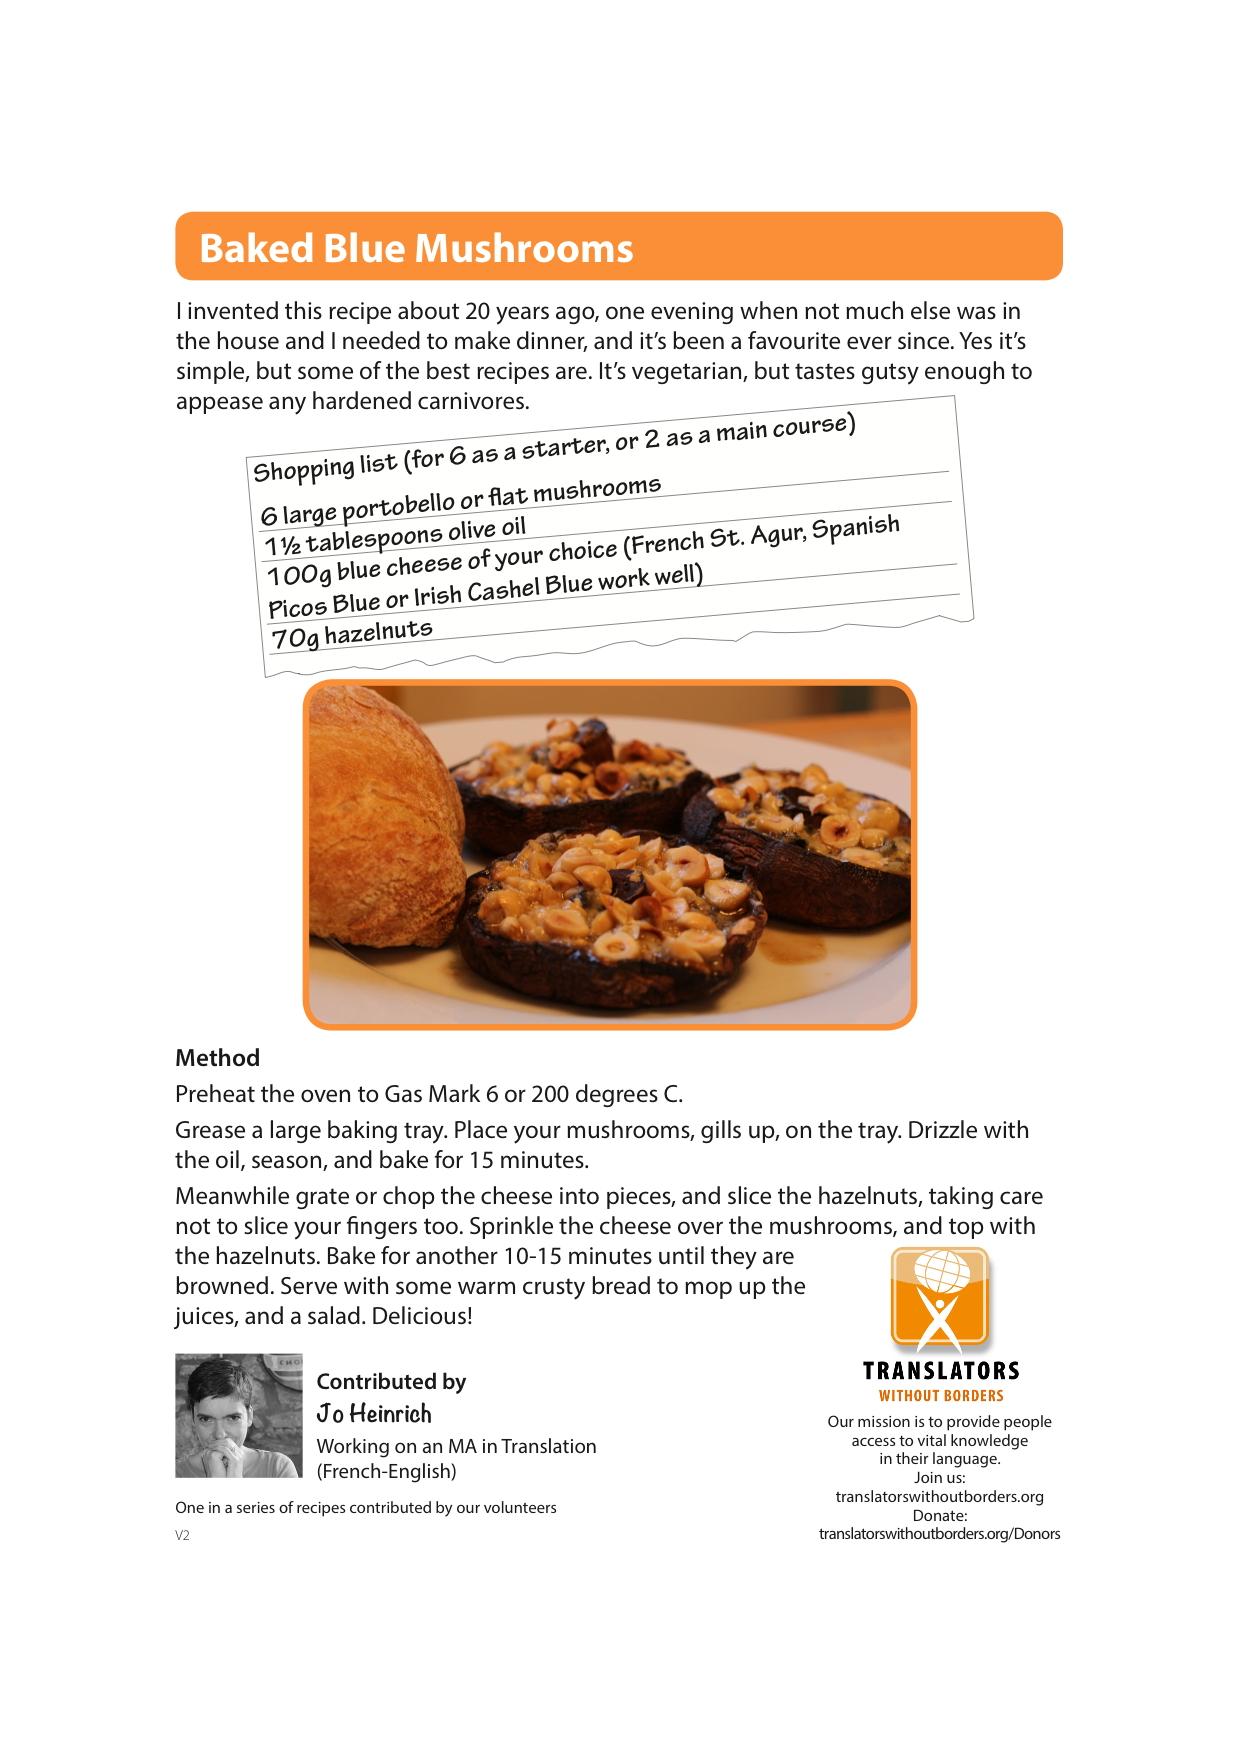 Baked blue mushrooms translators without borders cookbook download pdf forumfinder Image collections